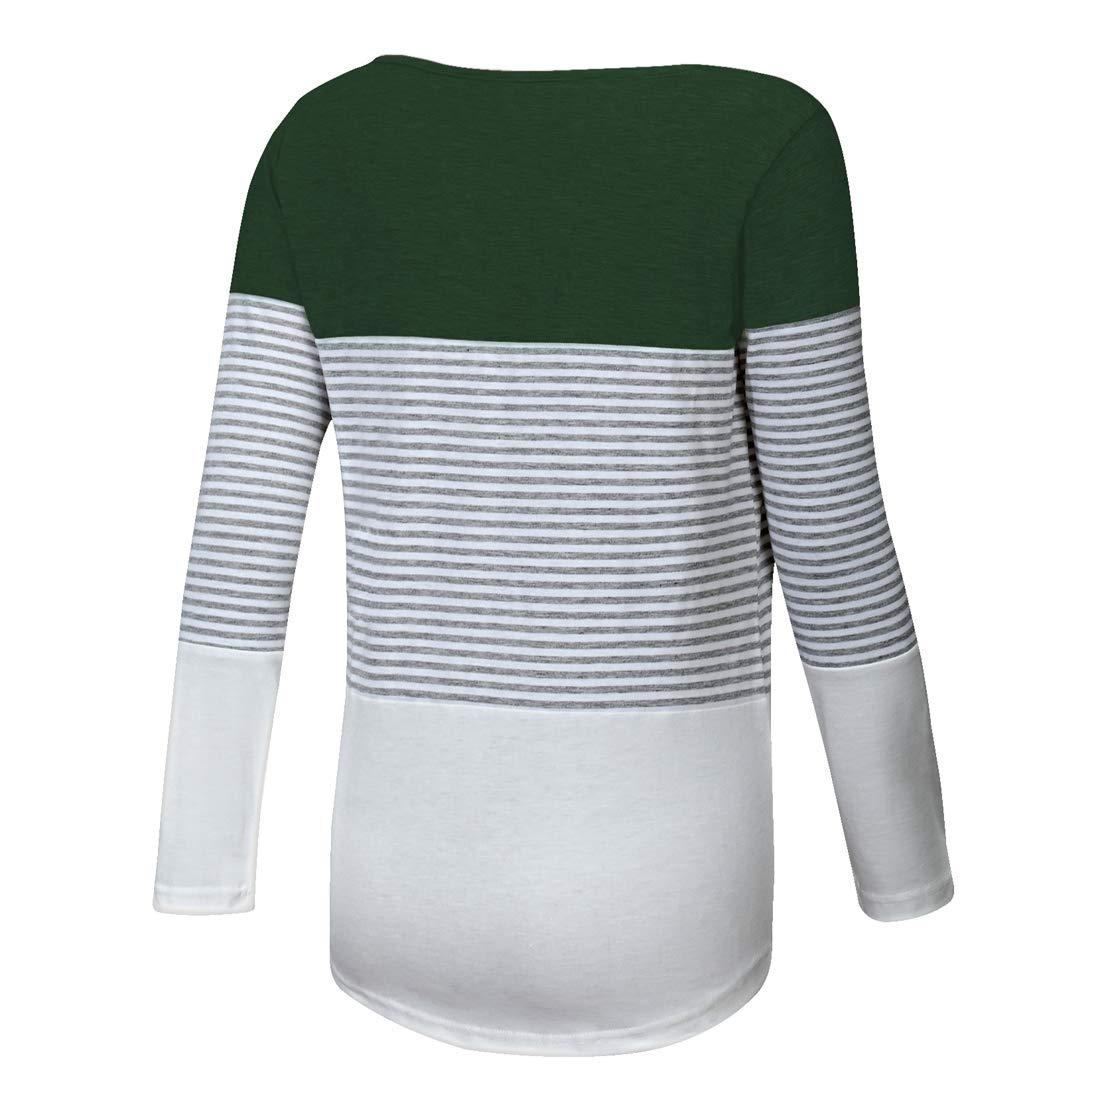 Gititlys Womens Striped Long Sleeve T-Shirts for Women Round Neck Loose T-Shirt(S-2XL) (M, A-Green)